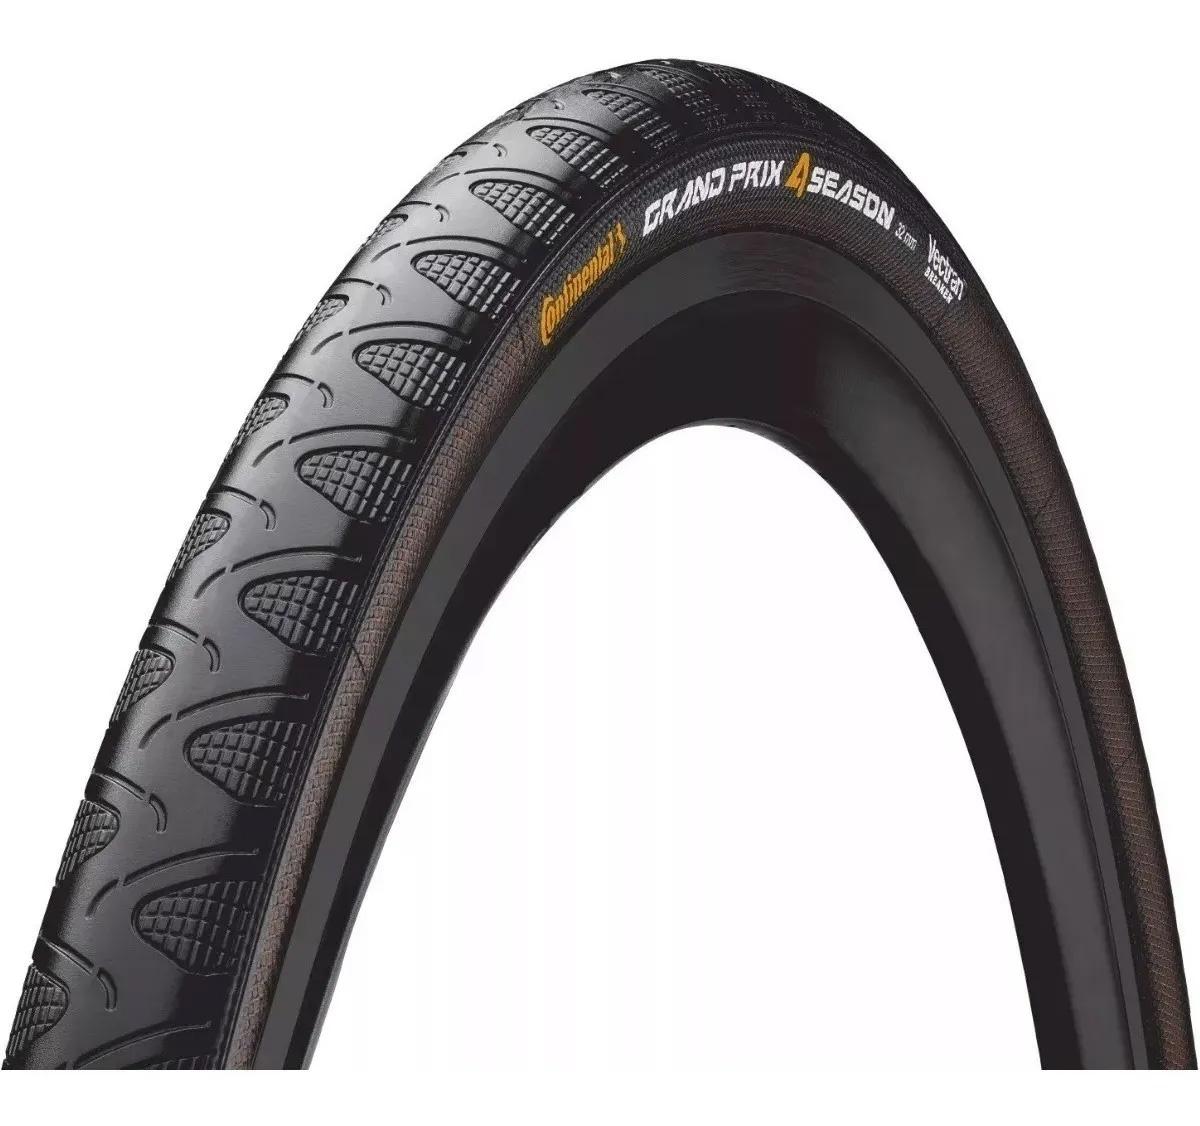 Pneu Continental Grand Prix 700x28 Antifuro Speed